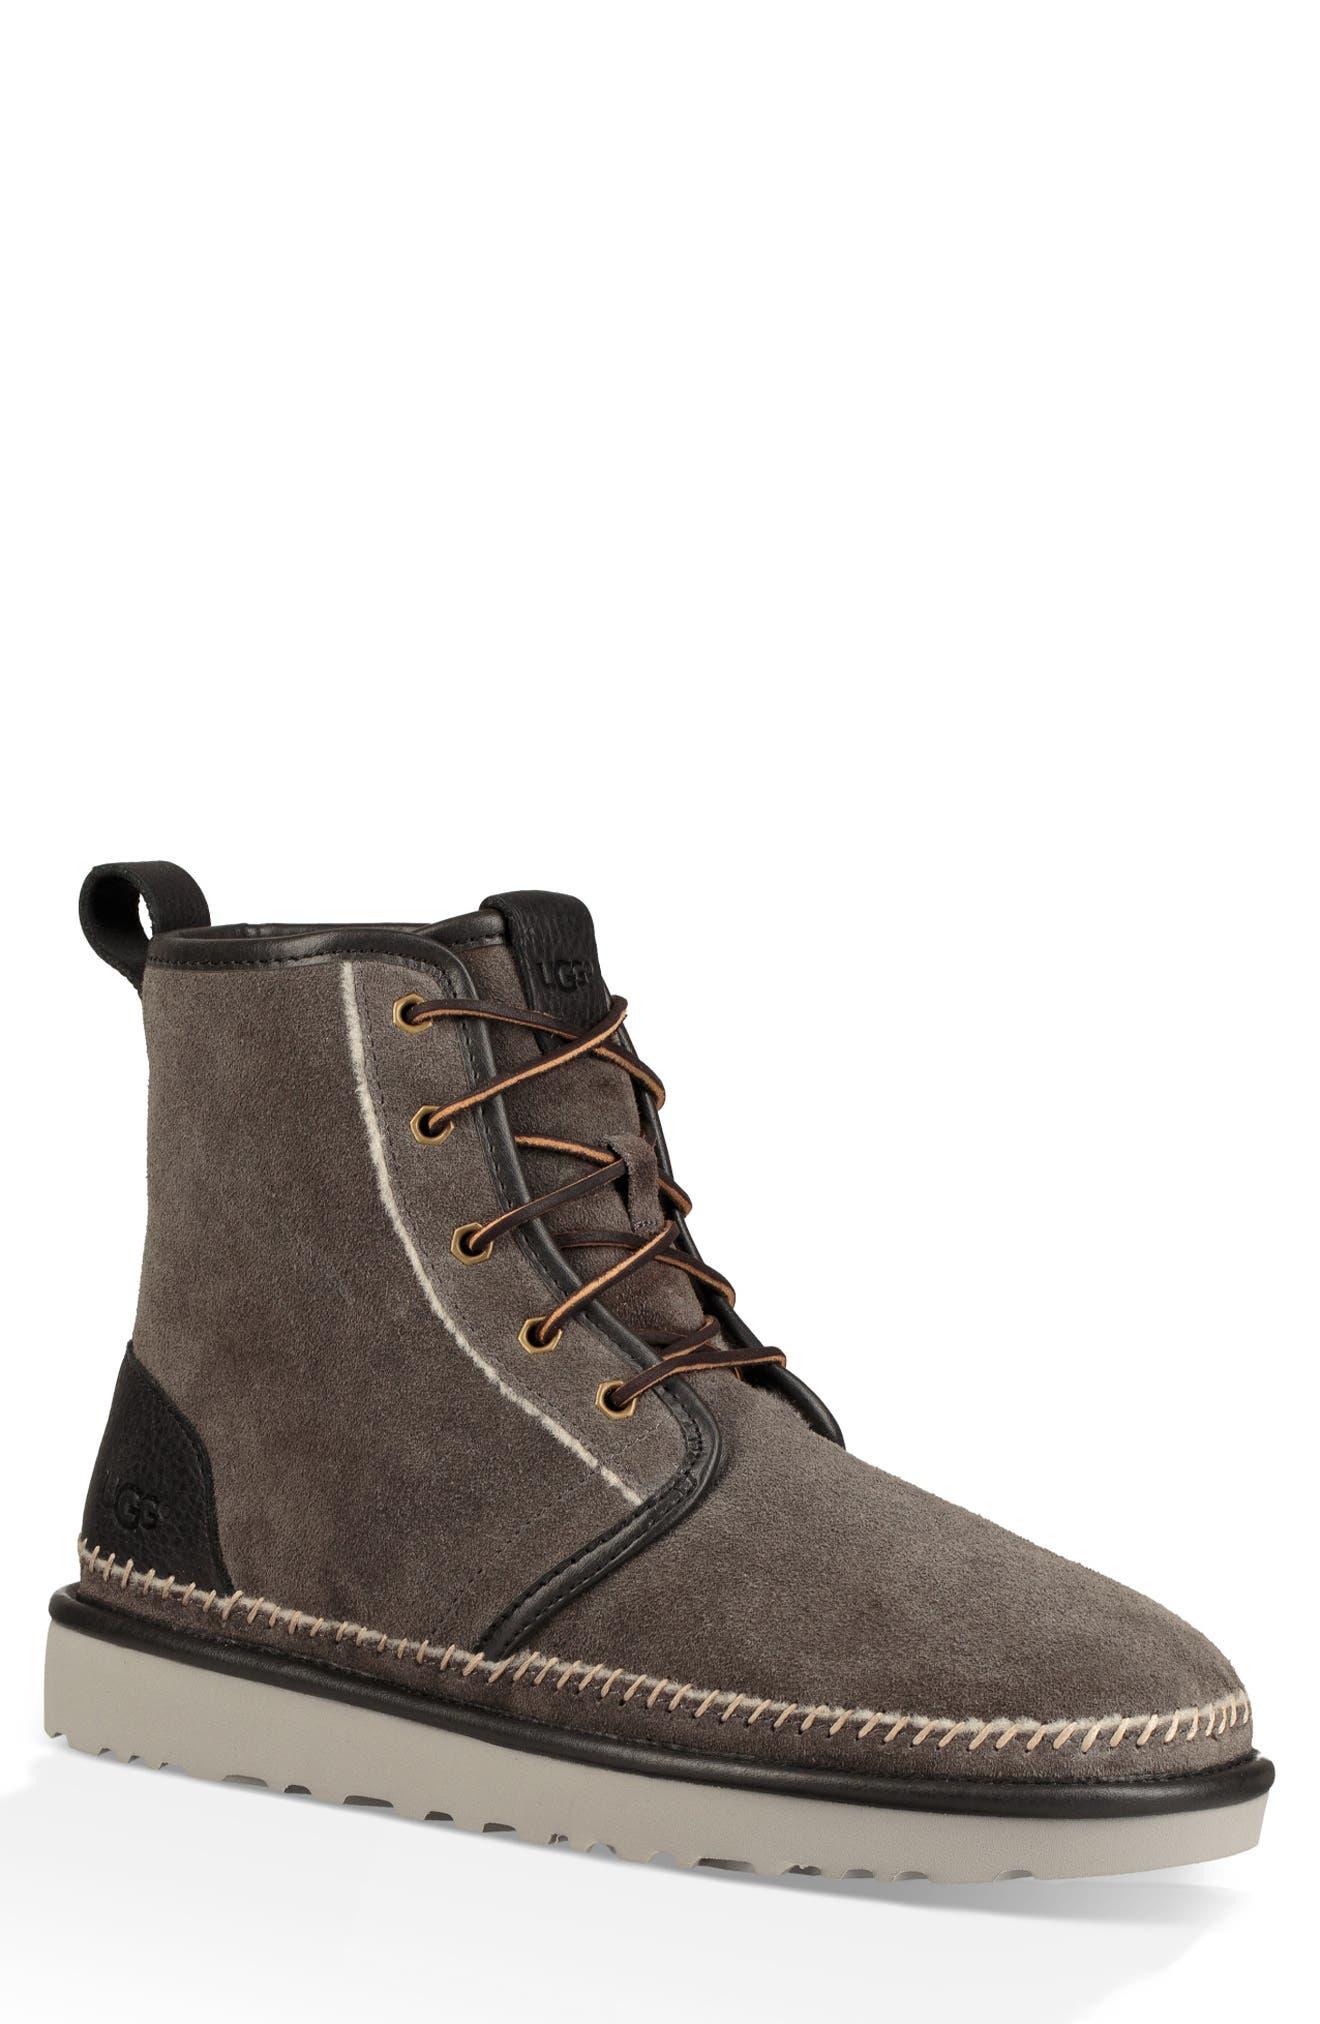 Harkley Stitch Plain Toe Boot,                         Main,                         color, DARK GREY